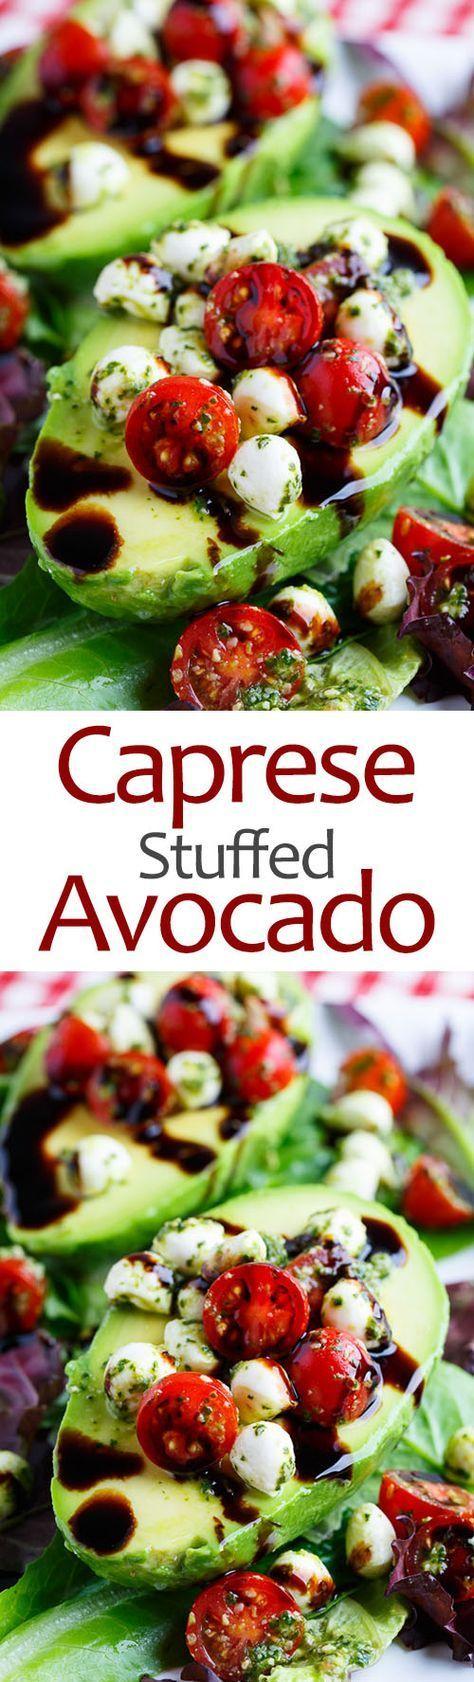 Caprese Stuffed Avocados